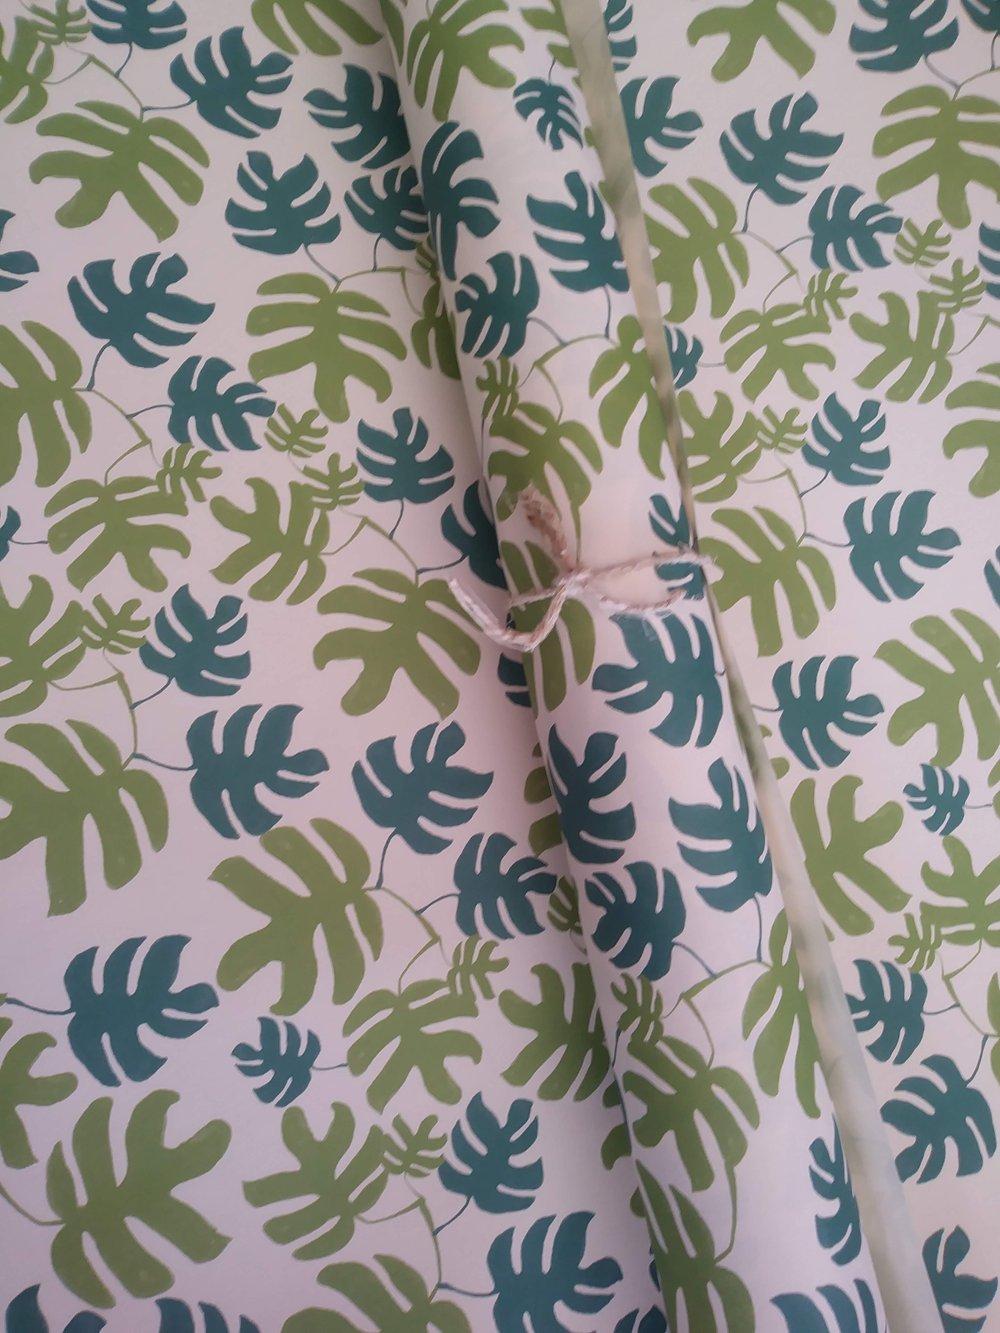 Image of Decorative paper Plants